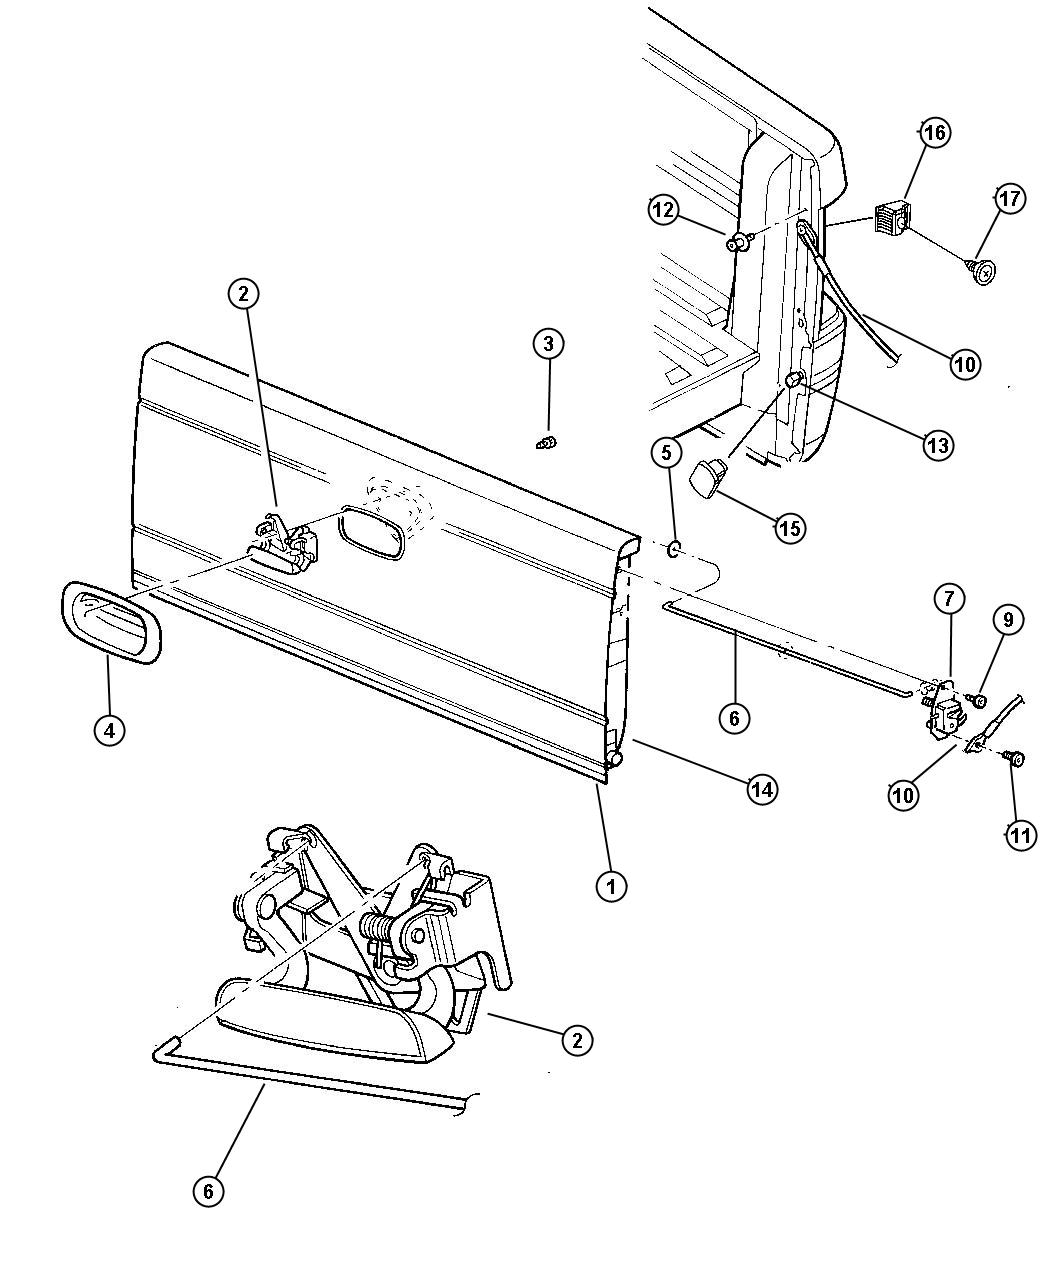 1994 dodge dakota wiring diagram traffic pattern toyota paseo repair manual html imageresizertool com